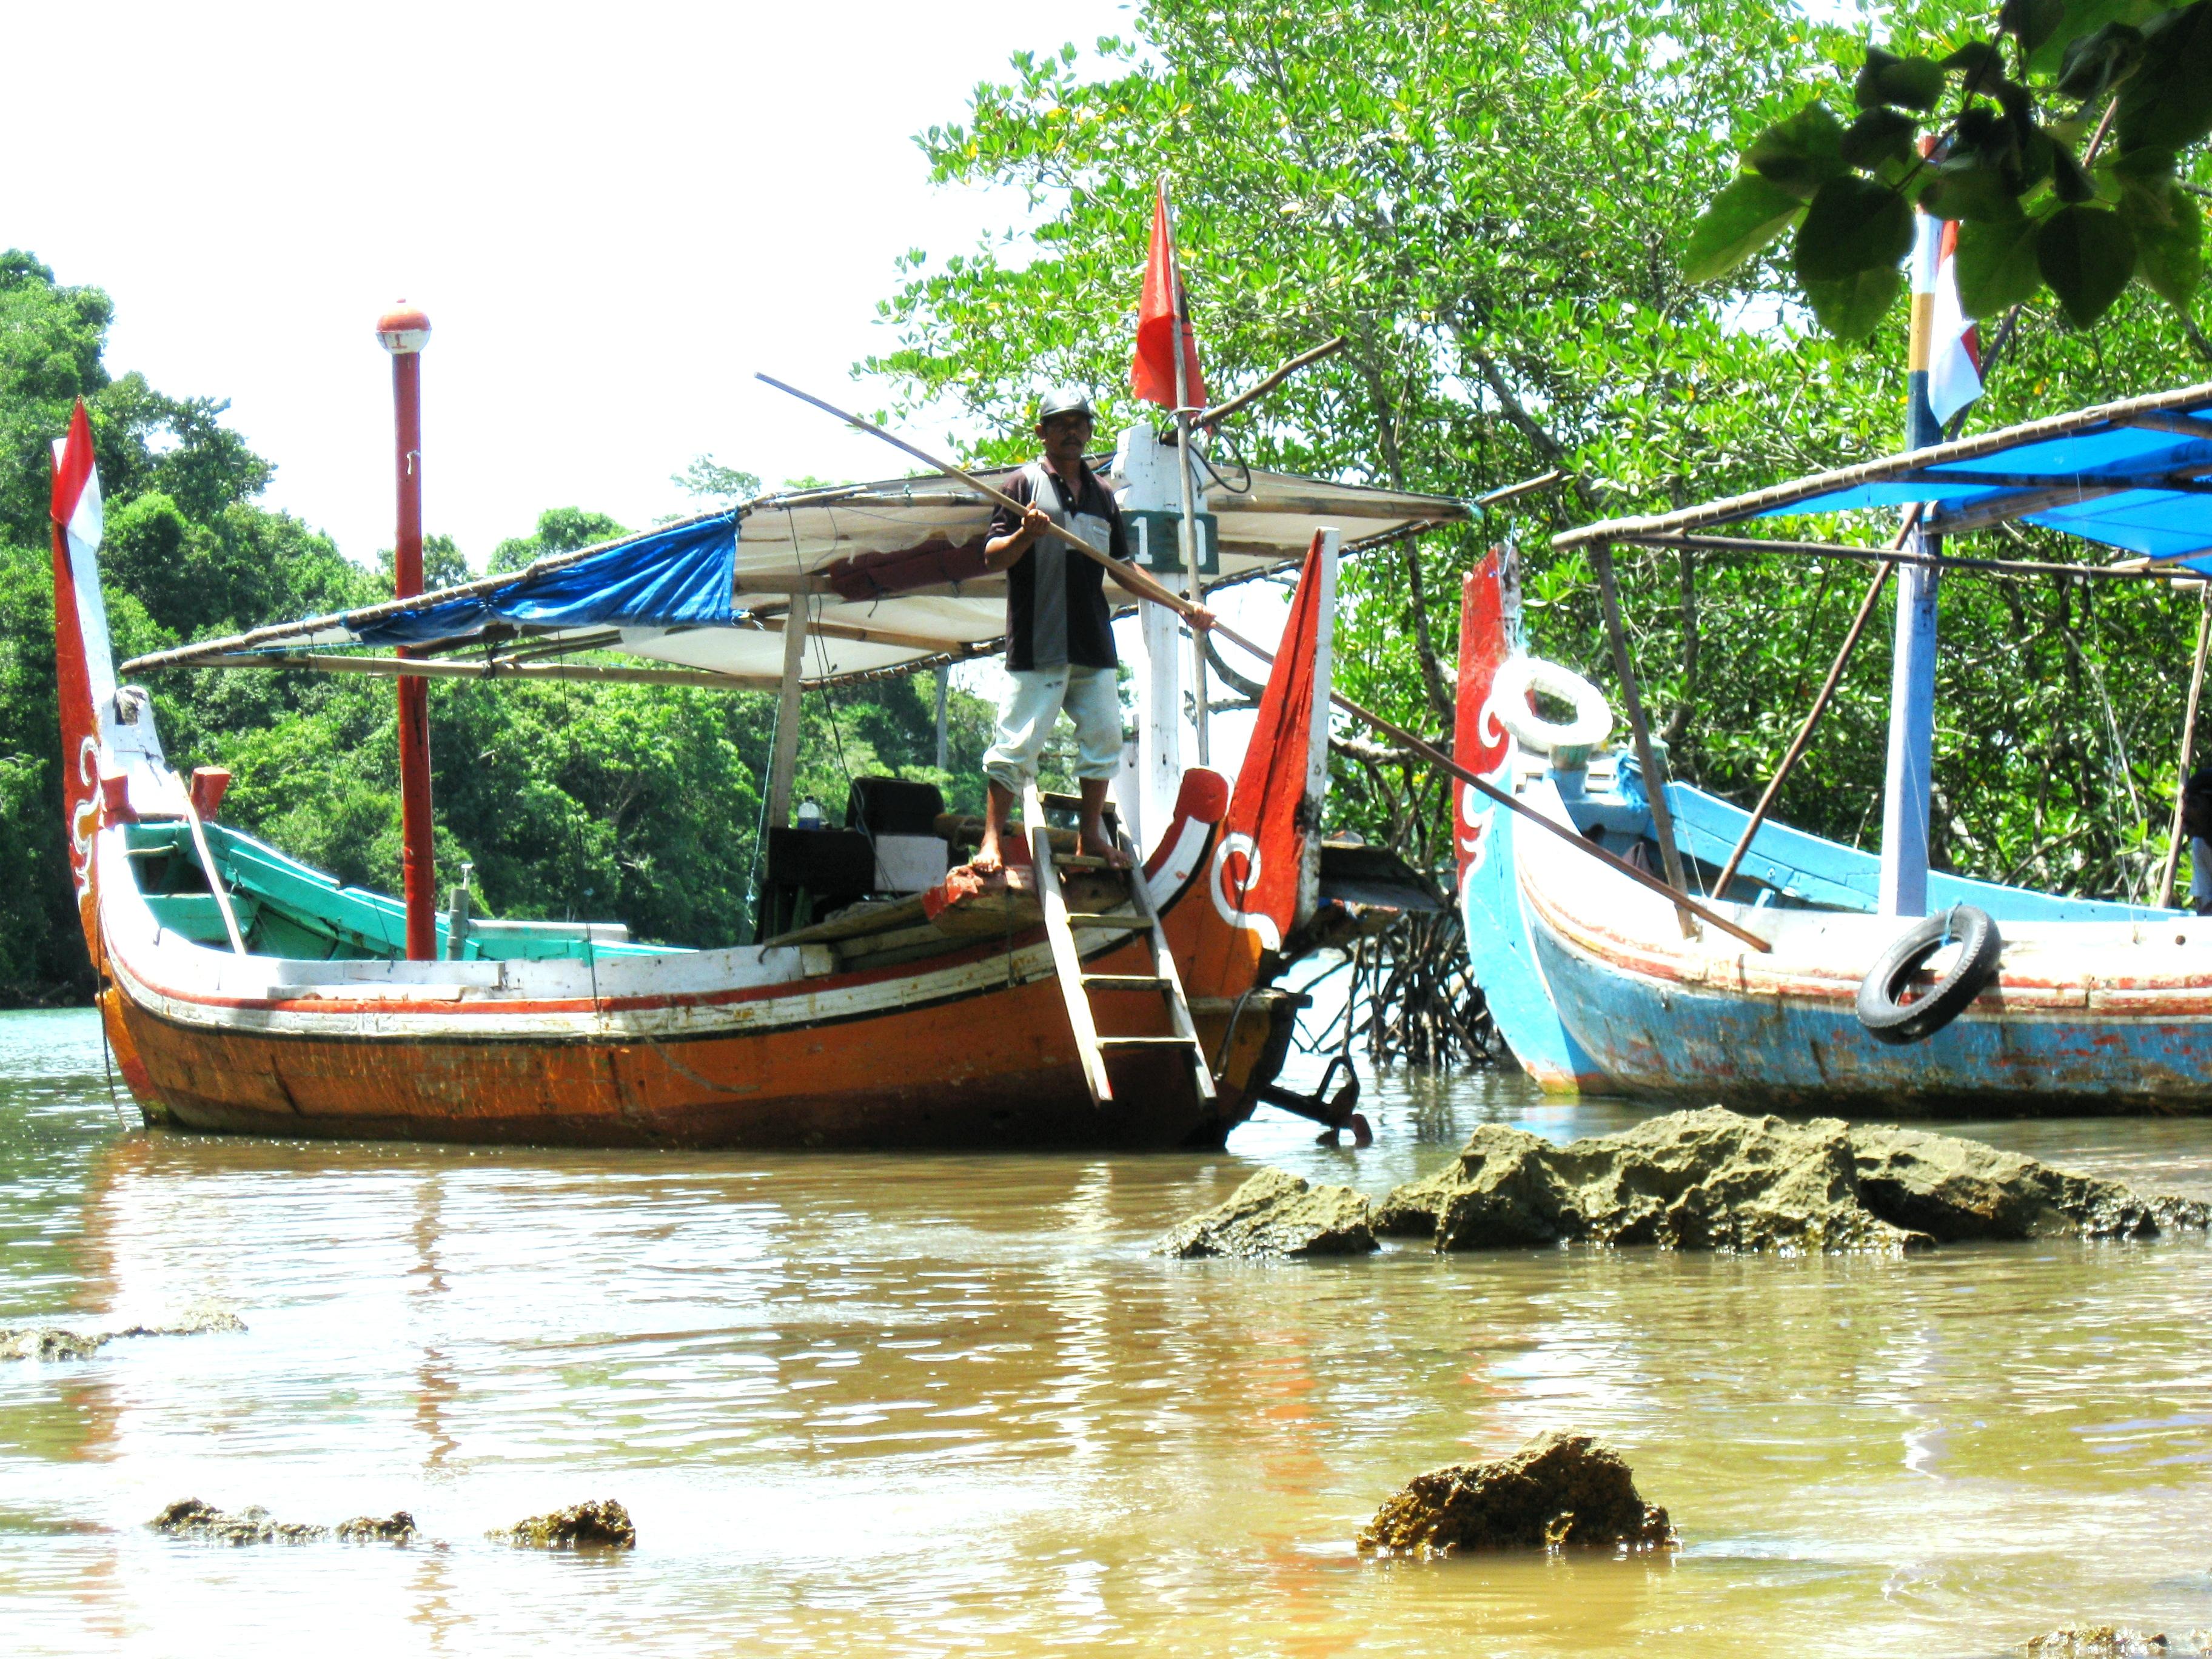 Jasa Perahu yang mengantarkan menyebrang ke Pulau Sempu